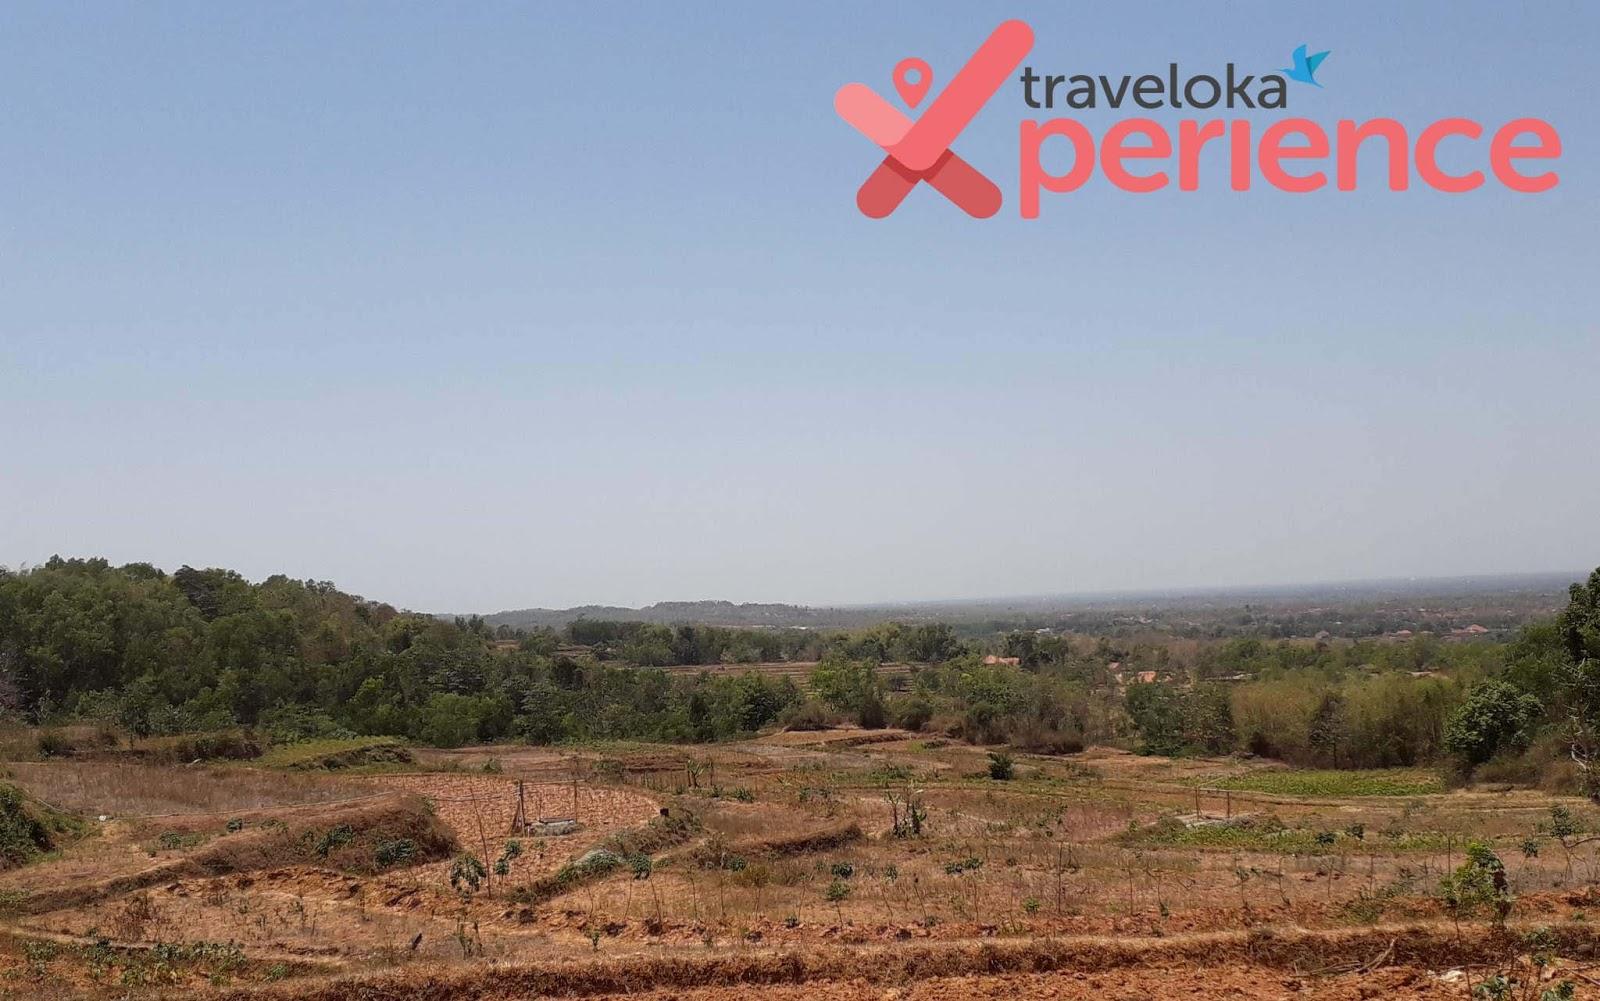 Liburan Makin Seru Dengan Traveloka Xperience